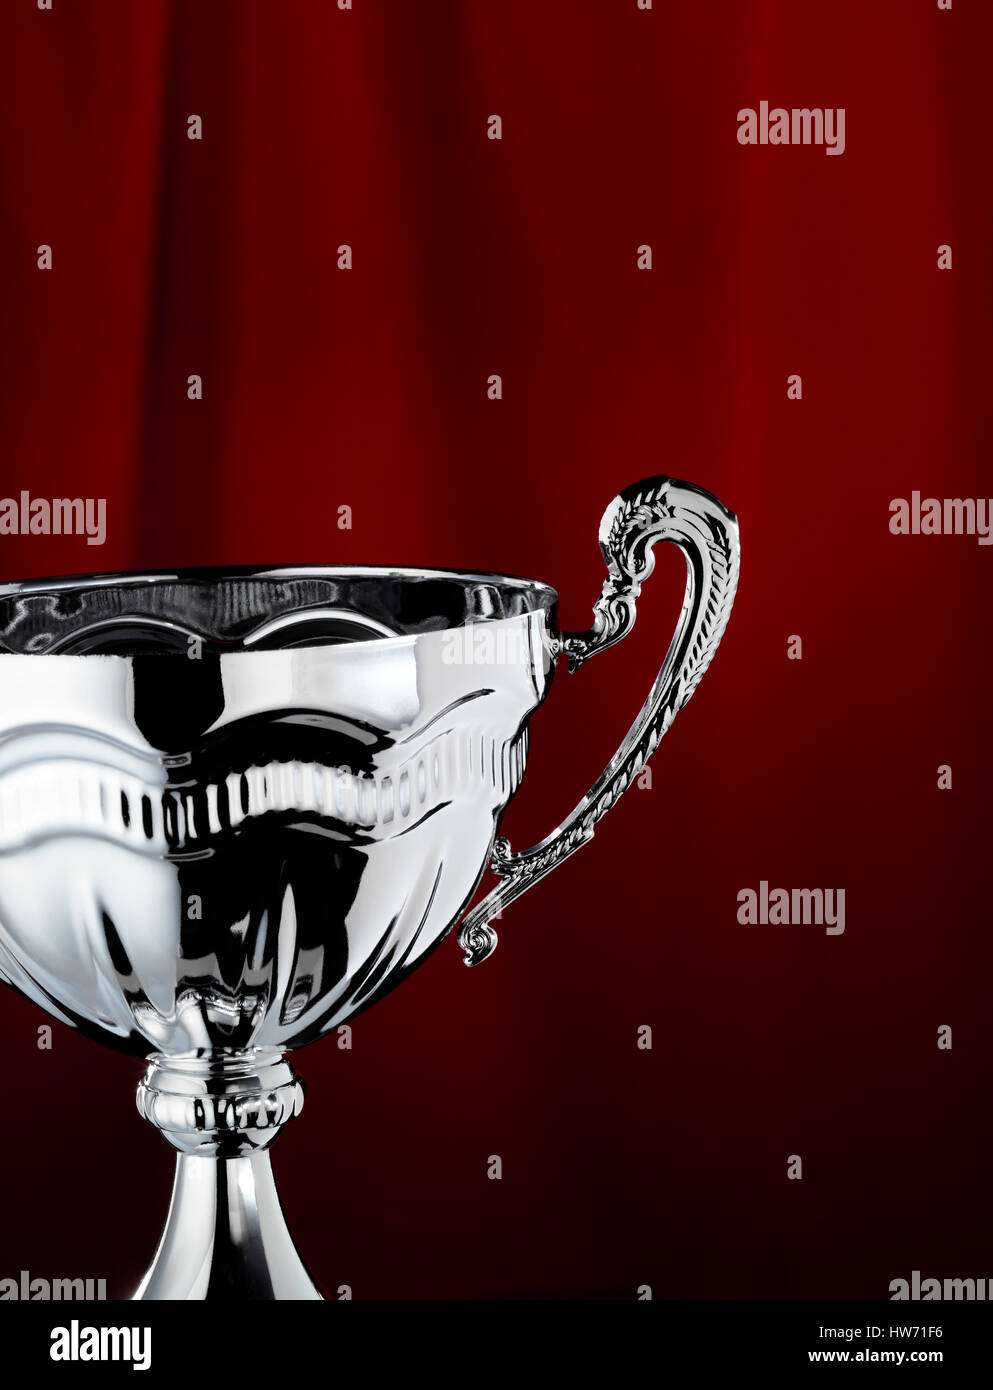 Trofeo con un telón de fondo rojo Imagen De Stock